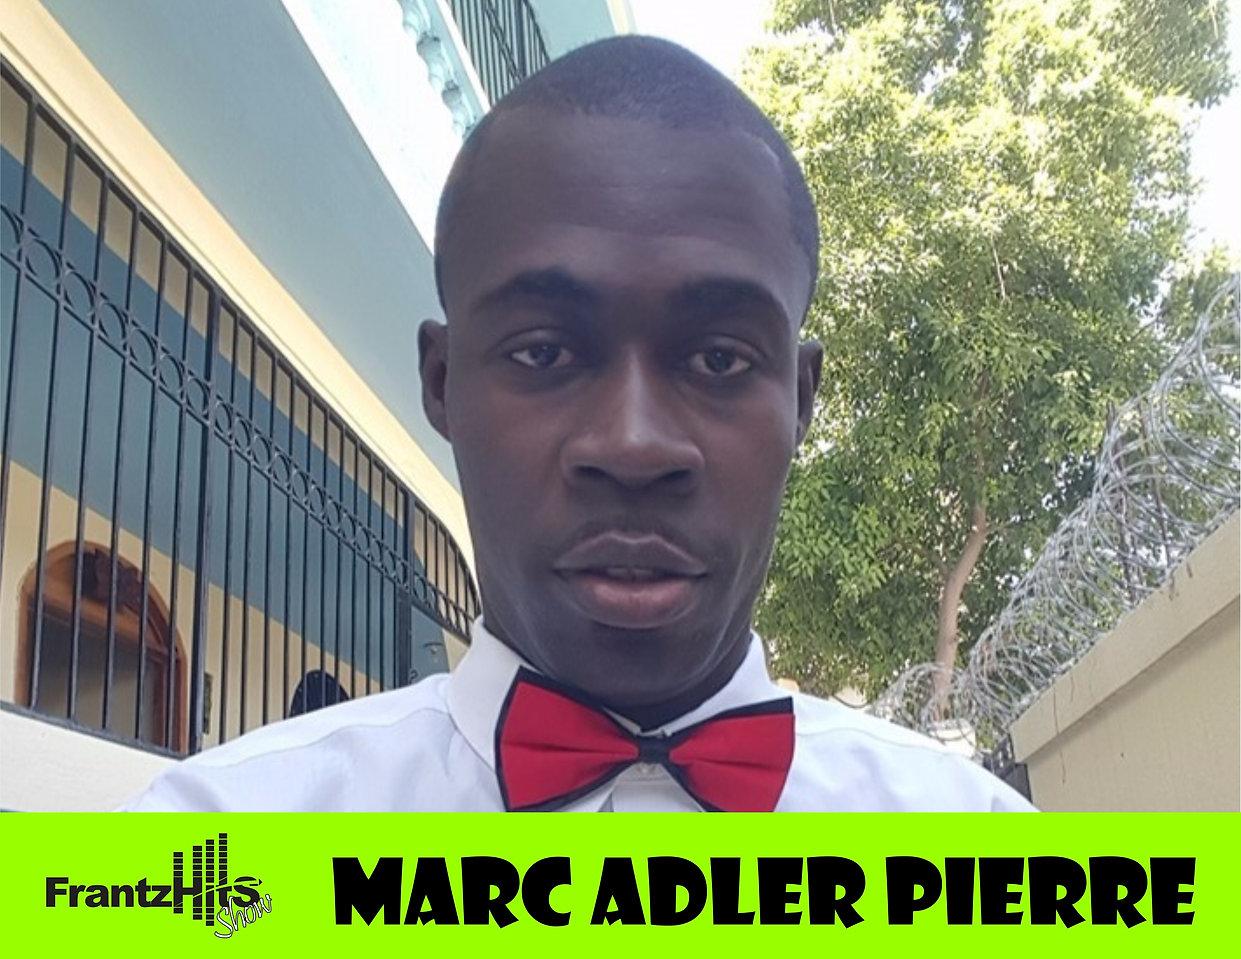 Marc Adler Pierre